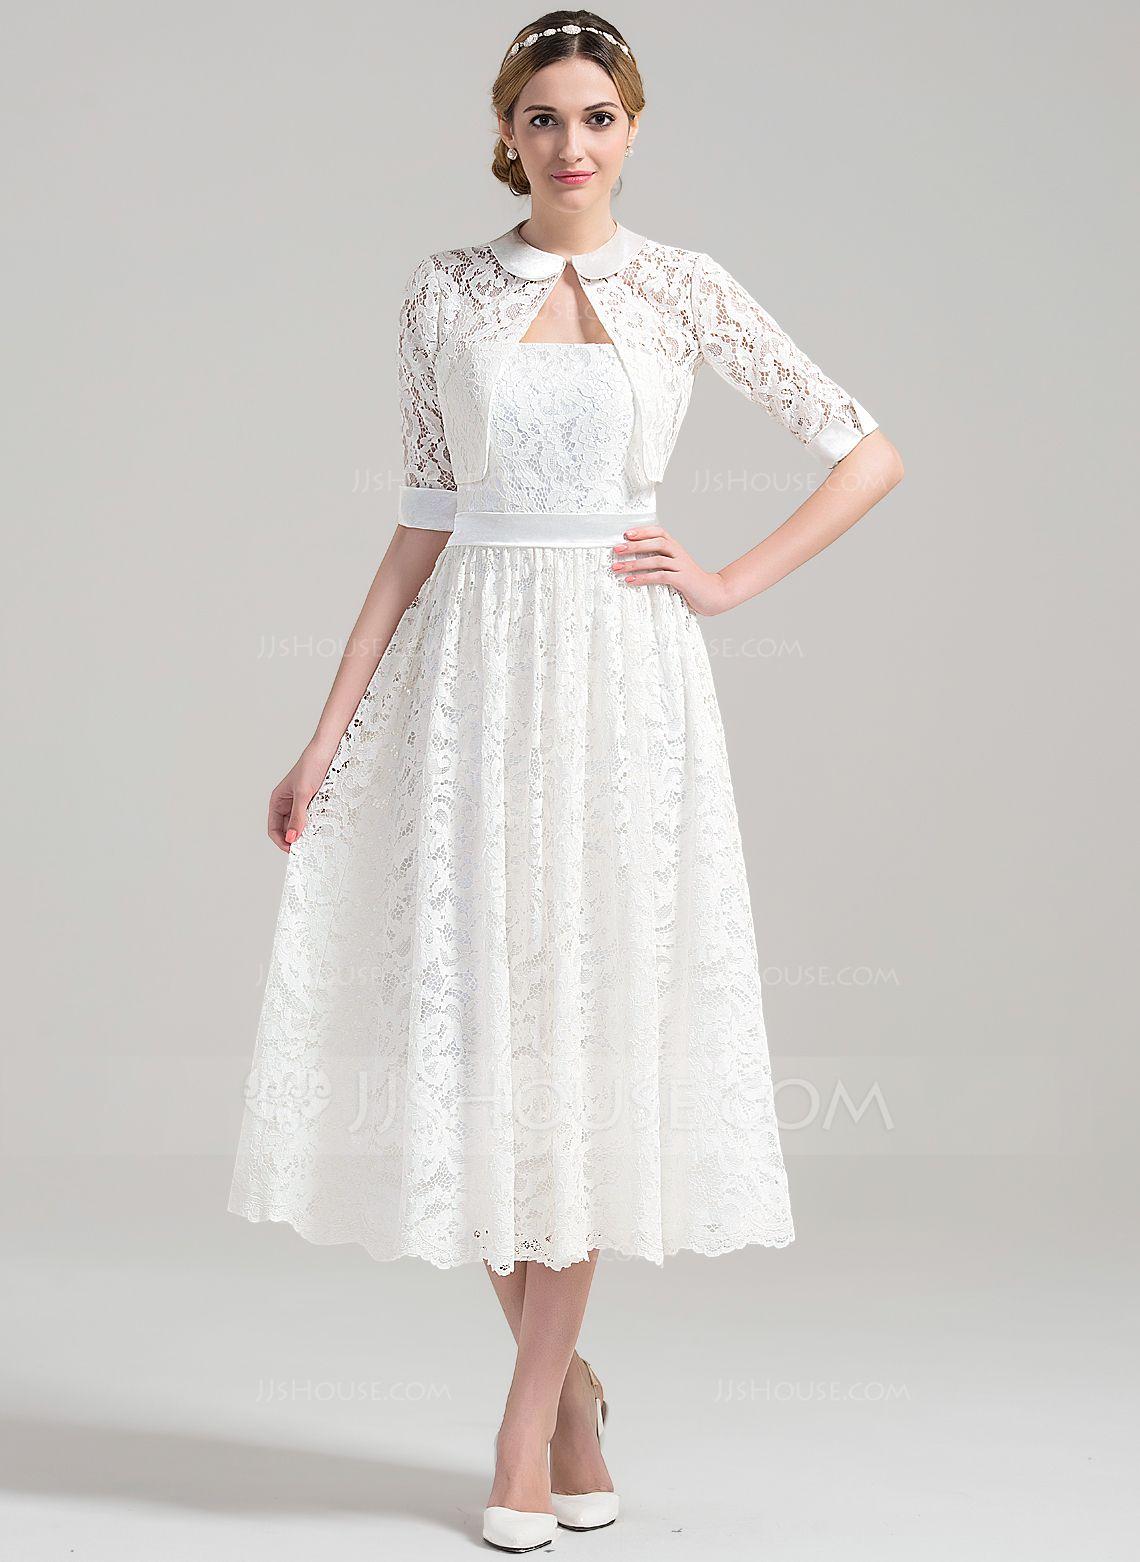 [£ 115.00] ALine/Princess Strapless TeaLength Lace